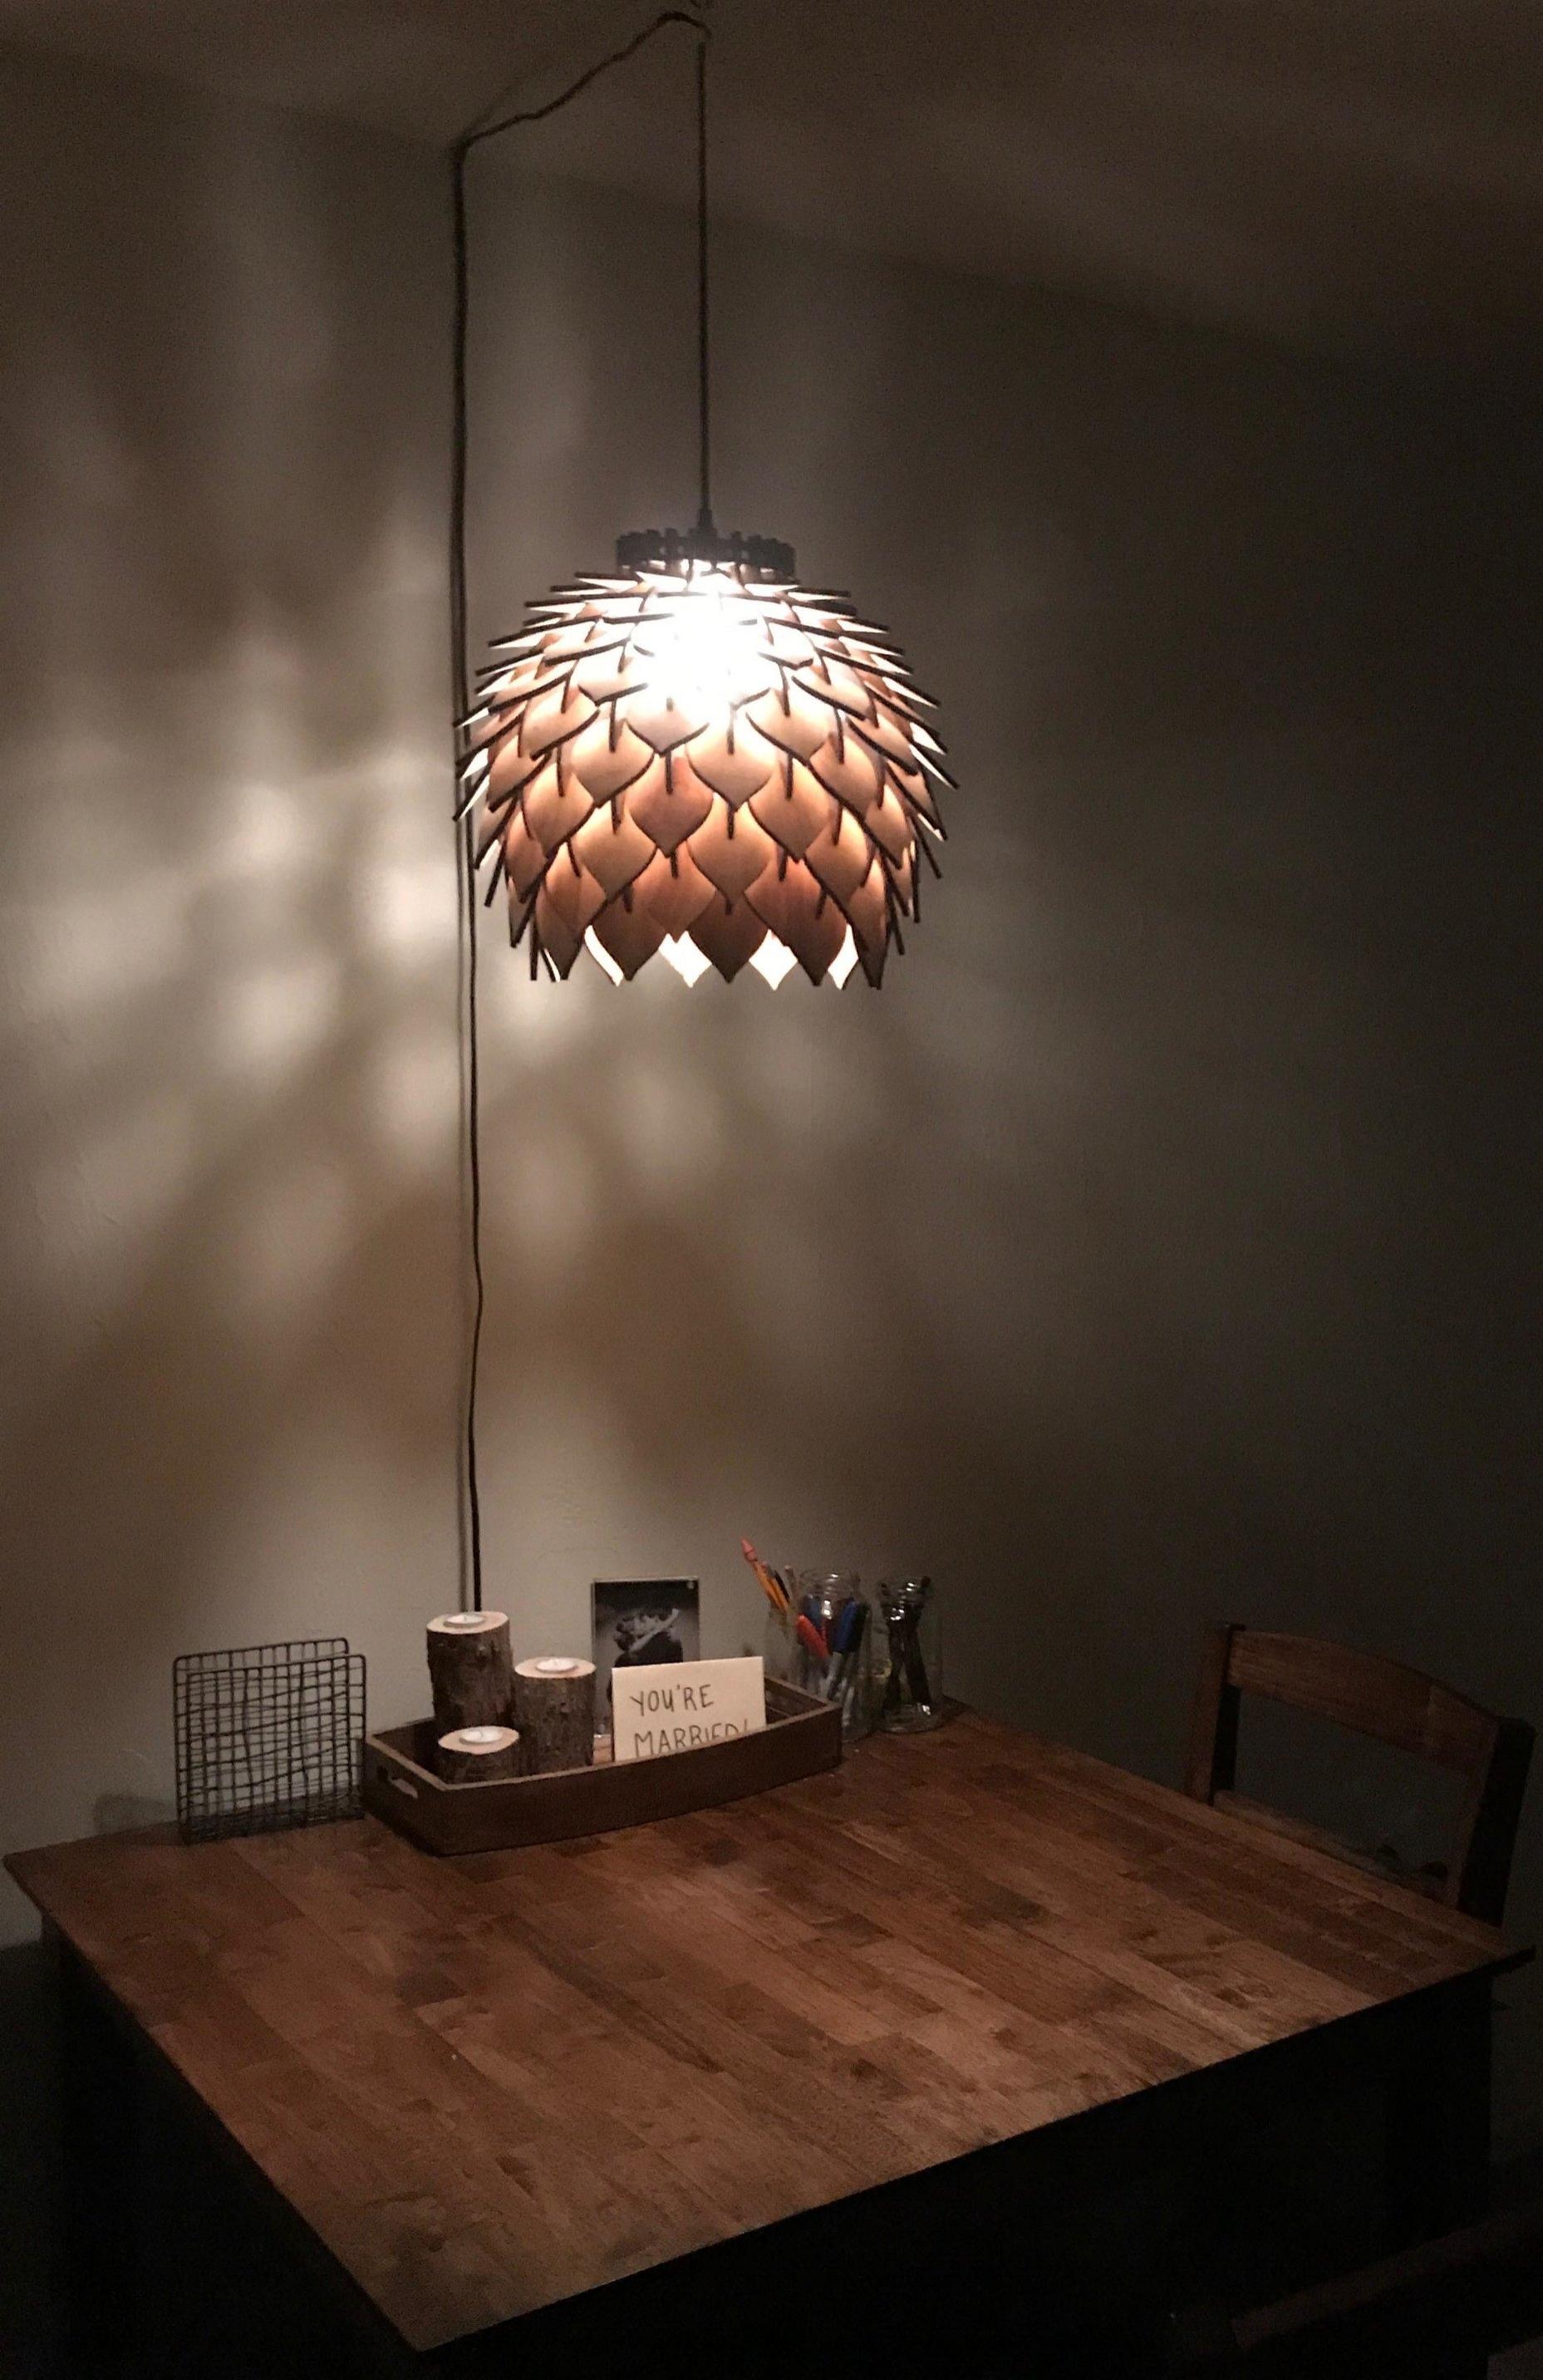 spore lamp 7 – handmade laser cut parametric postmodern interior light geometric wooden pendant lamp terraform design.jpg